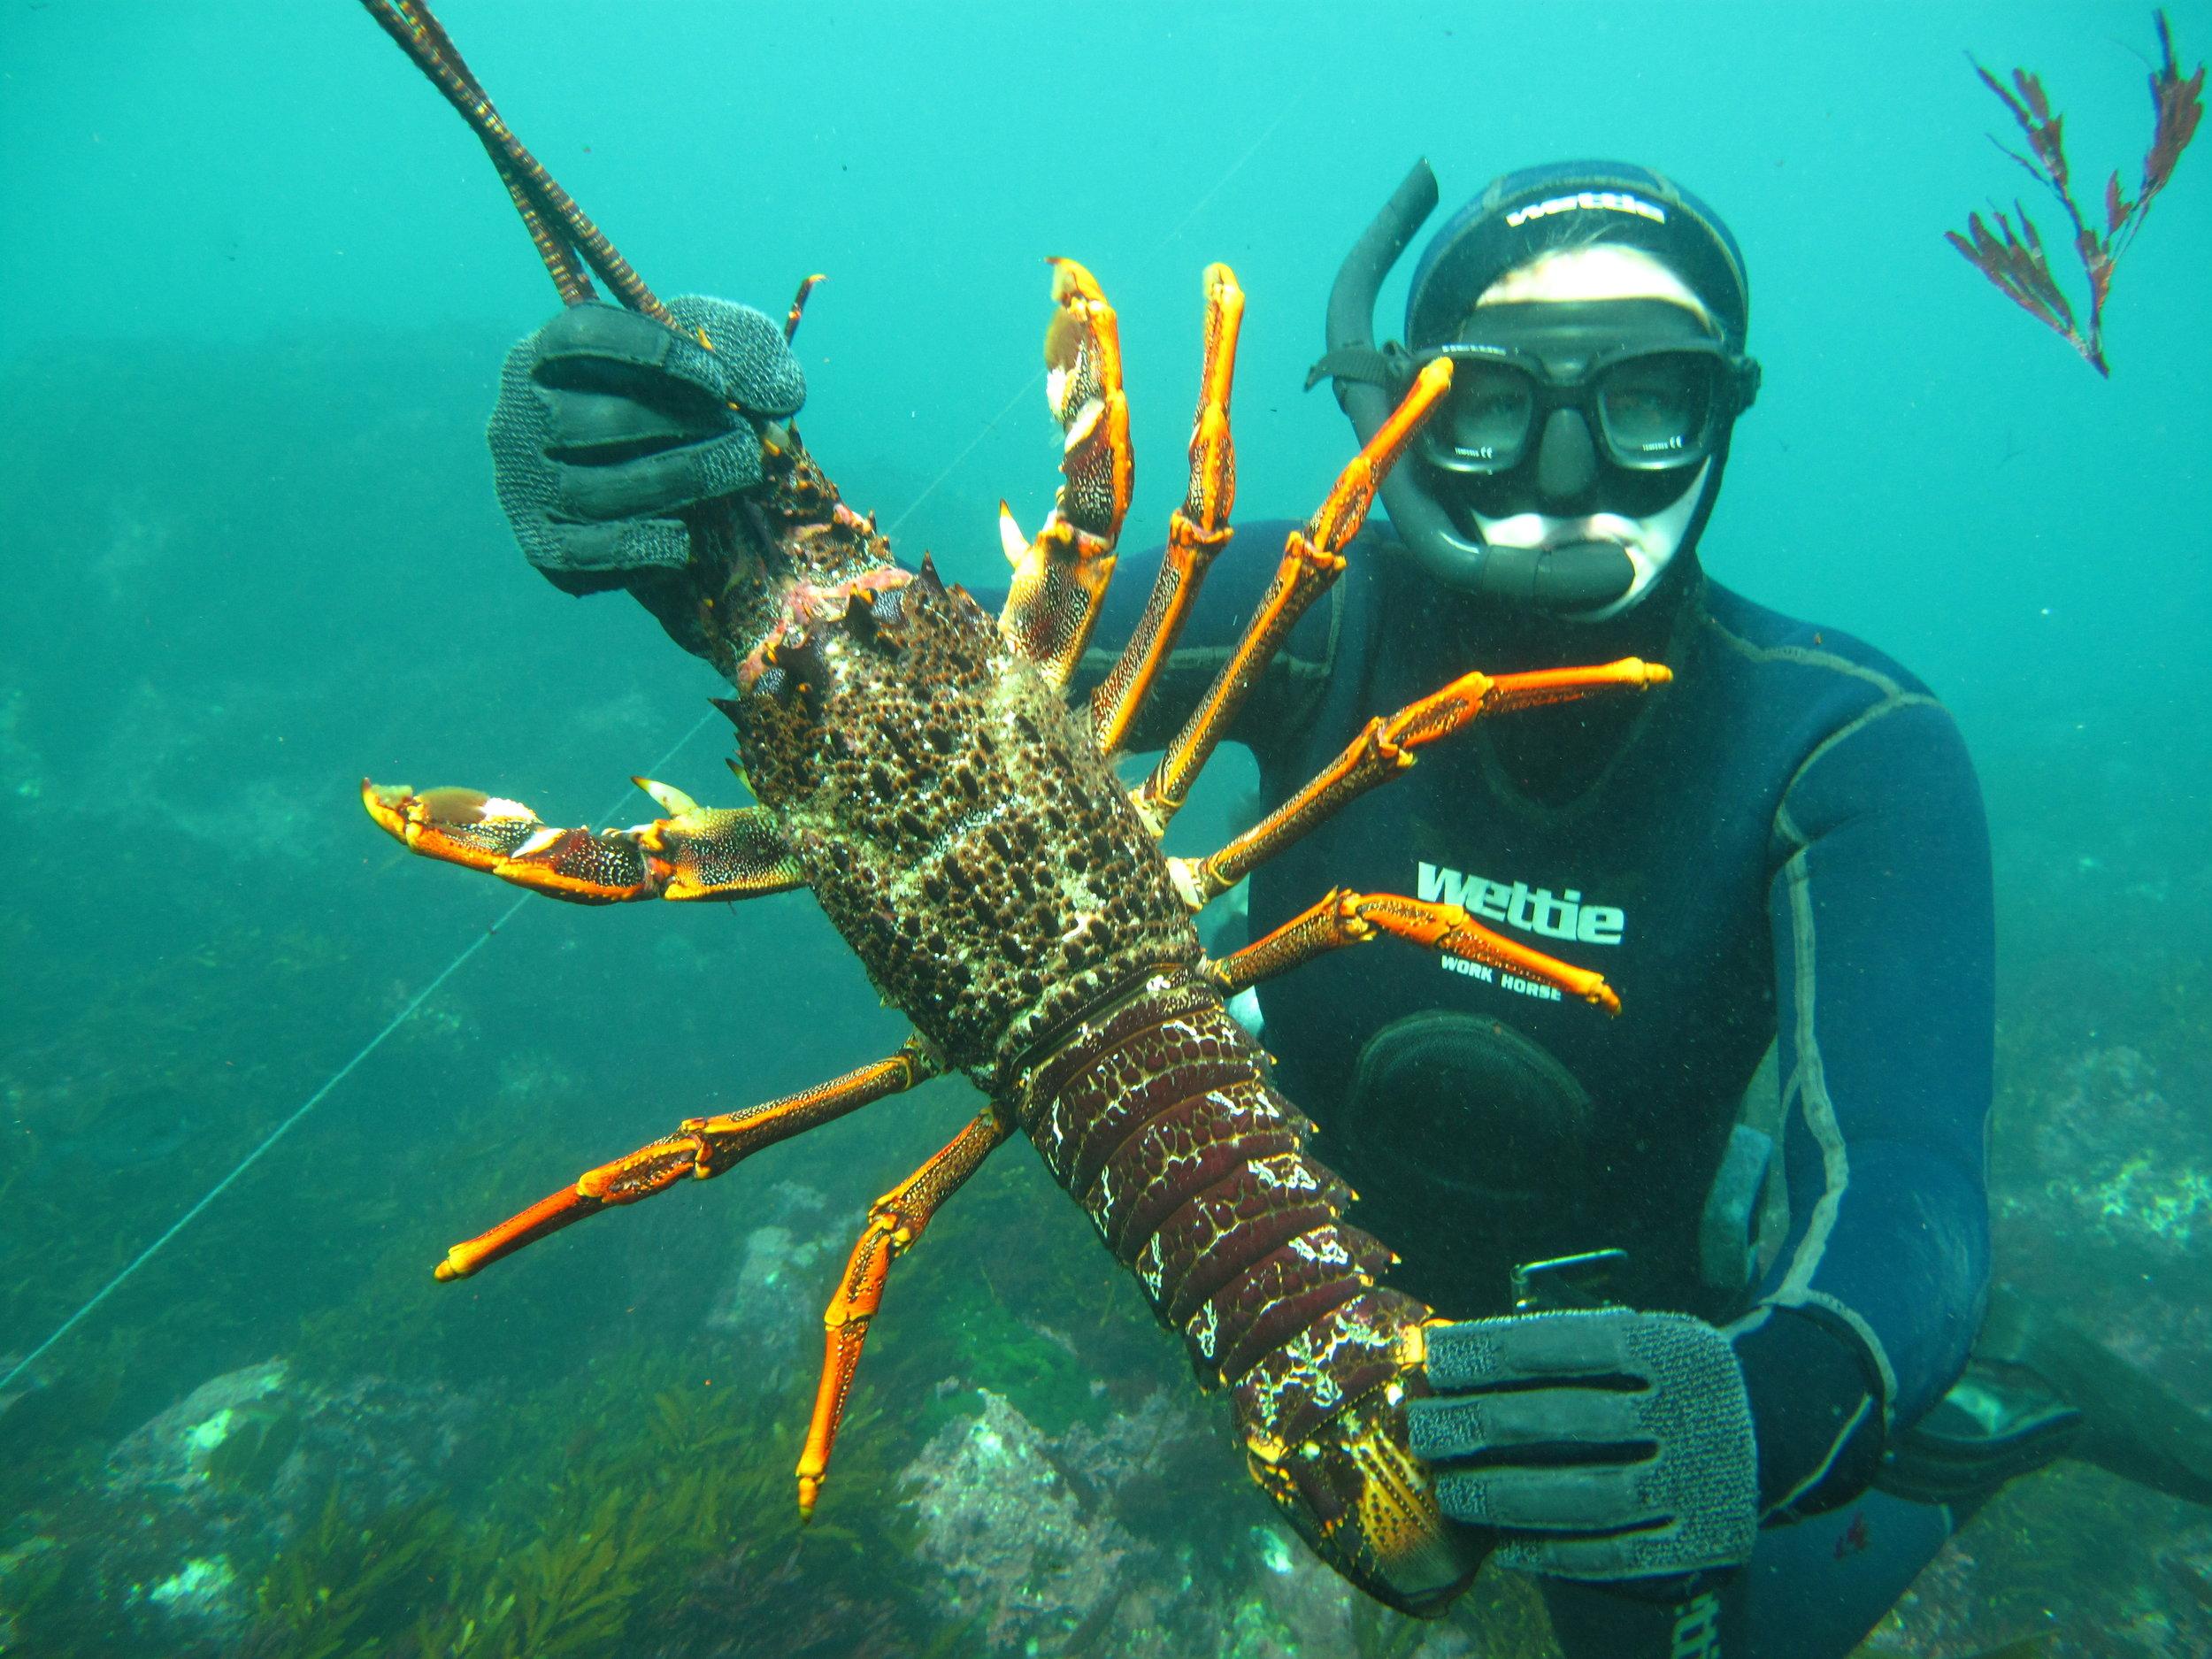 Crayfish Snorkling Adventure - Learn More